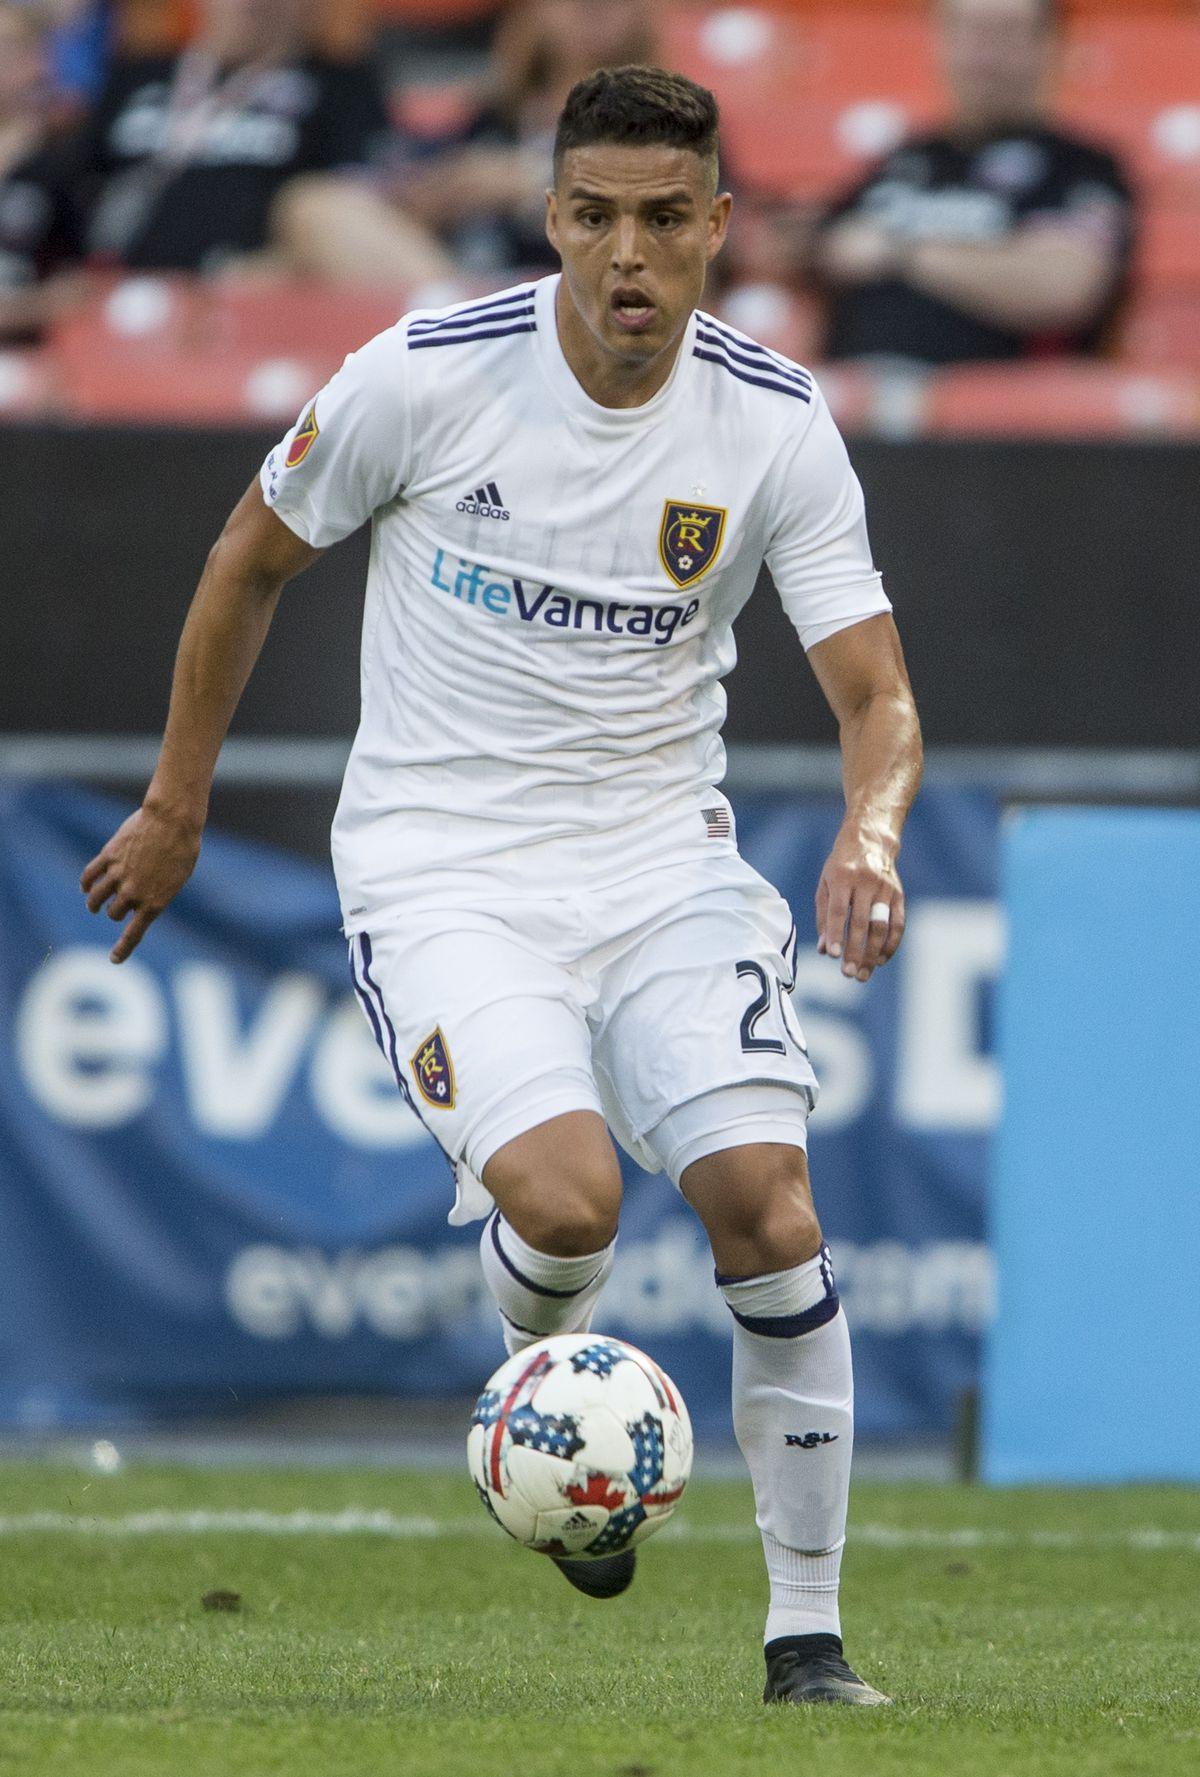 SOCCER: AUG 13 MLS - Real Salt Lake at DC United